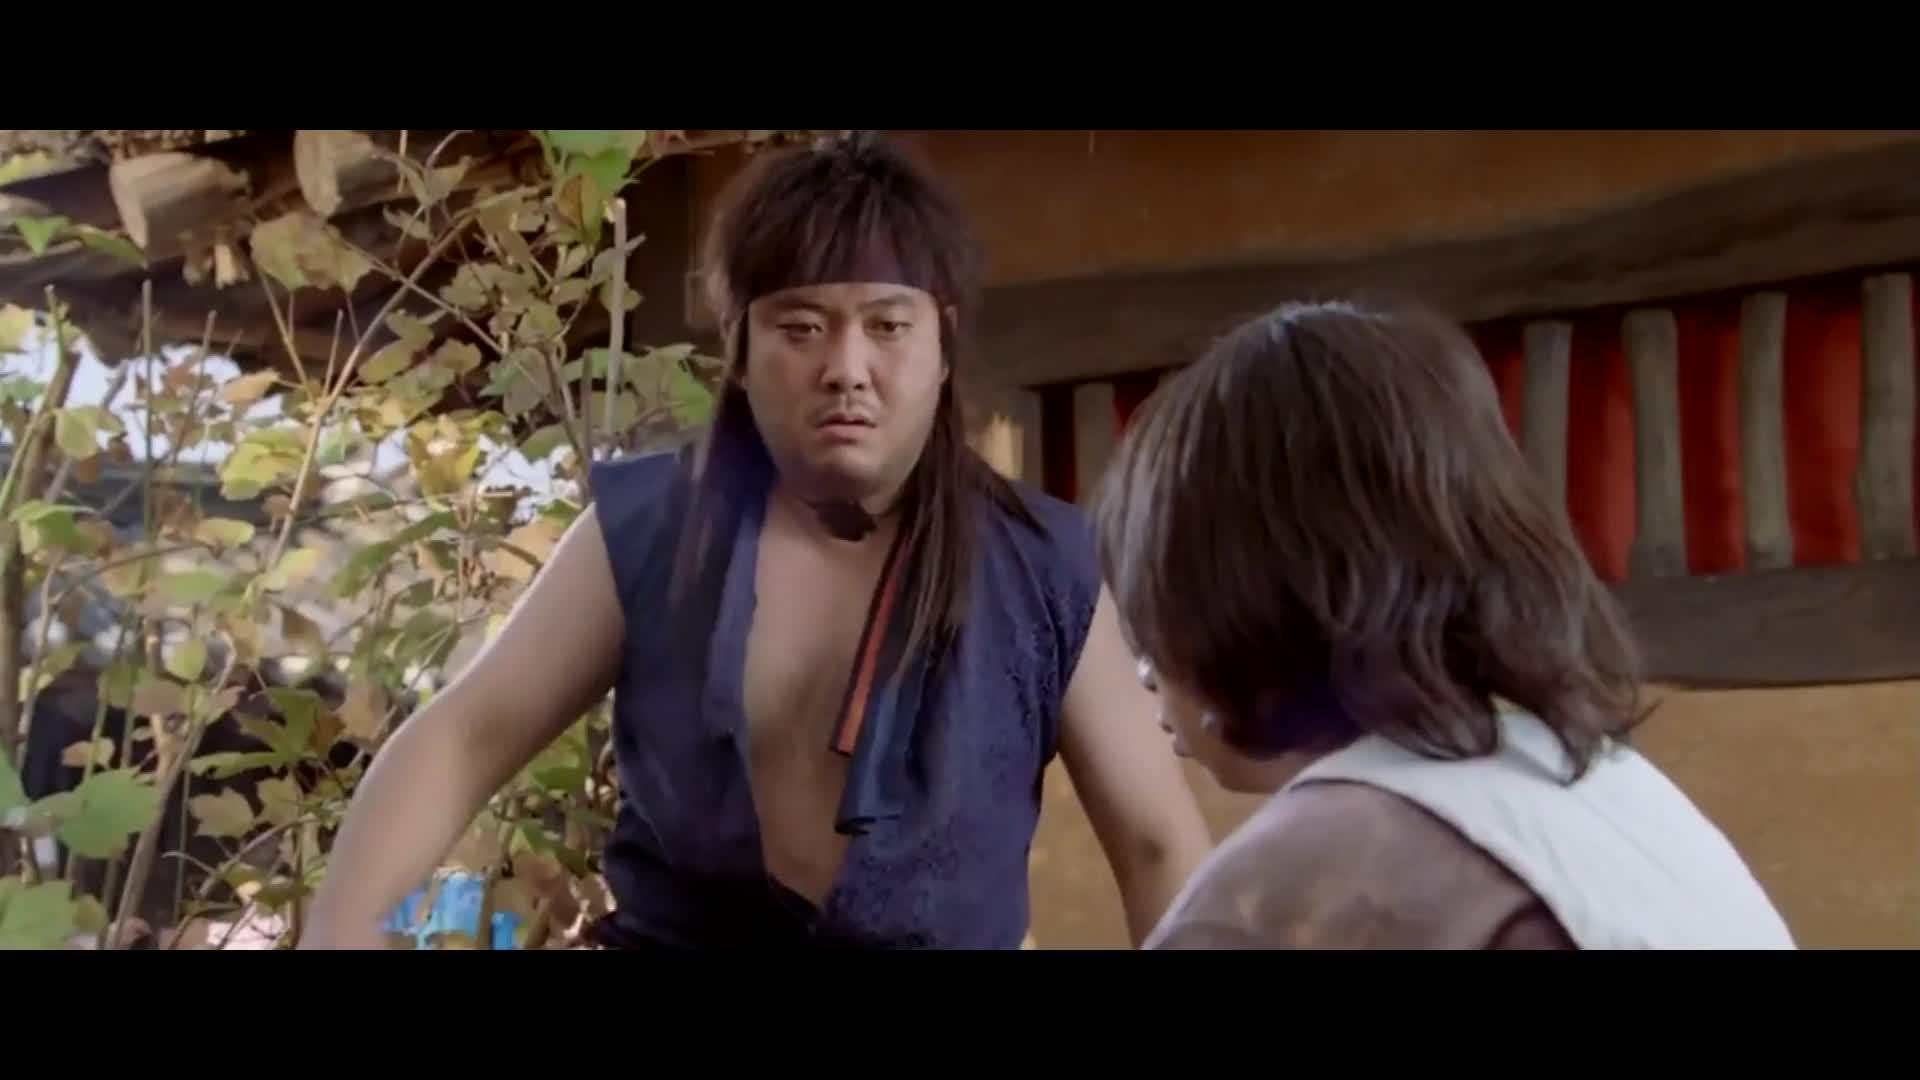 A Tale of Legendary Libido ไอ้หนุ่มพลังช้าง ไวอาก้าเรียกพี่ (2008)